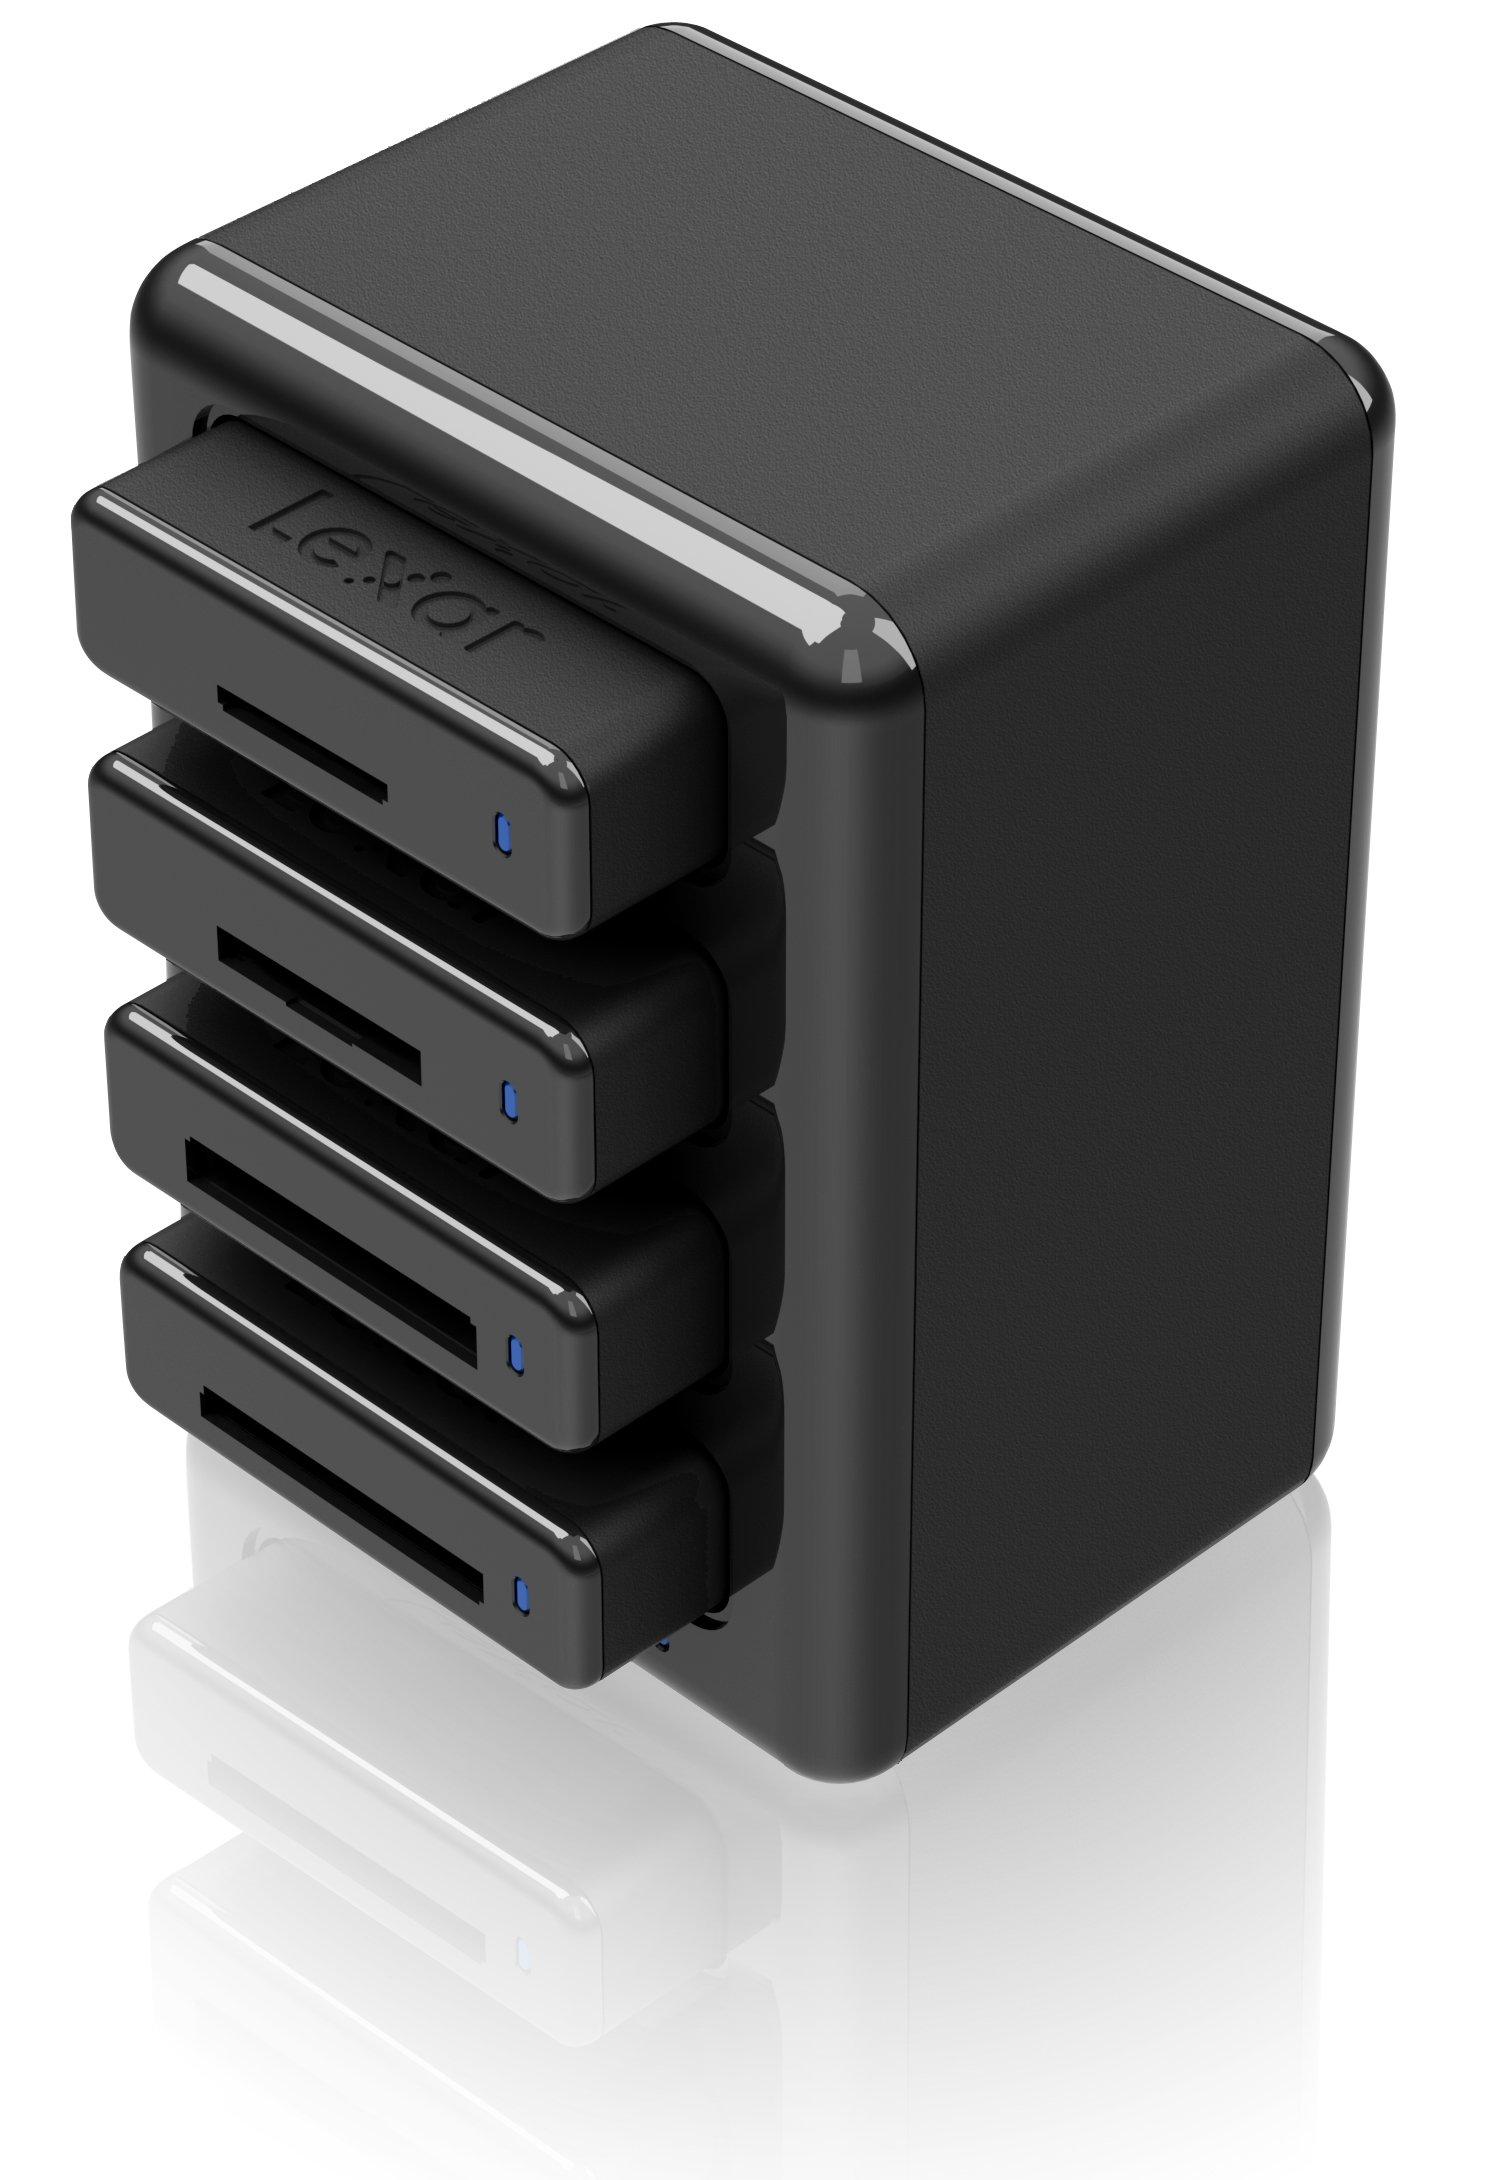 Lexar Professional Workflow Hub HR1 USB 3.0